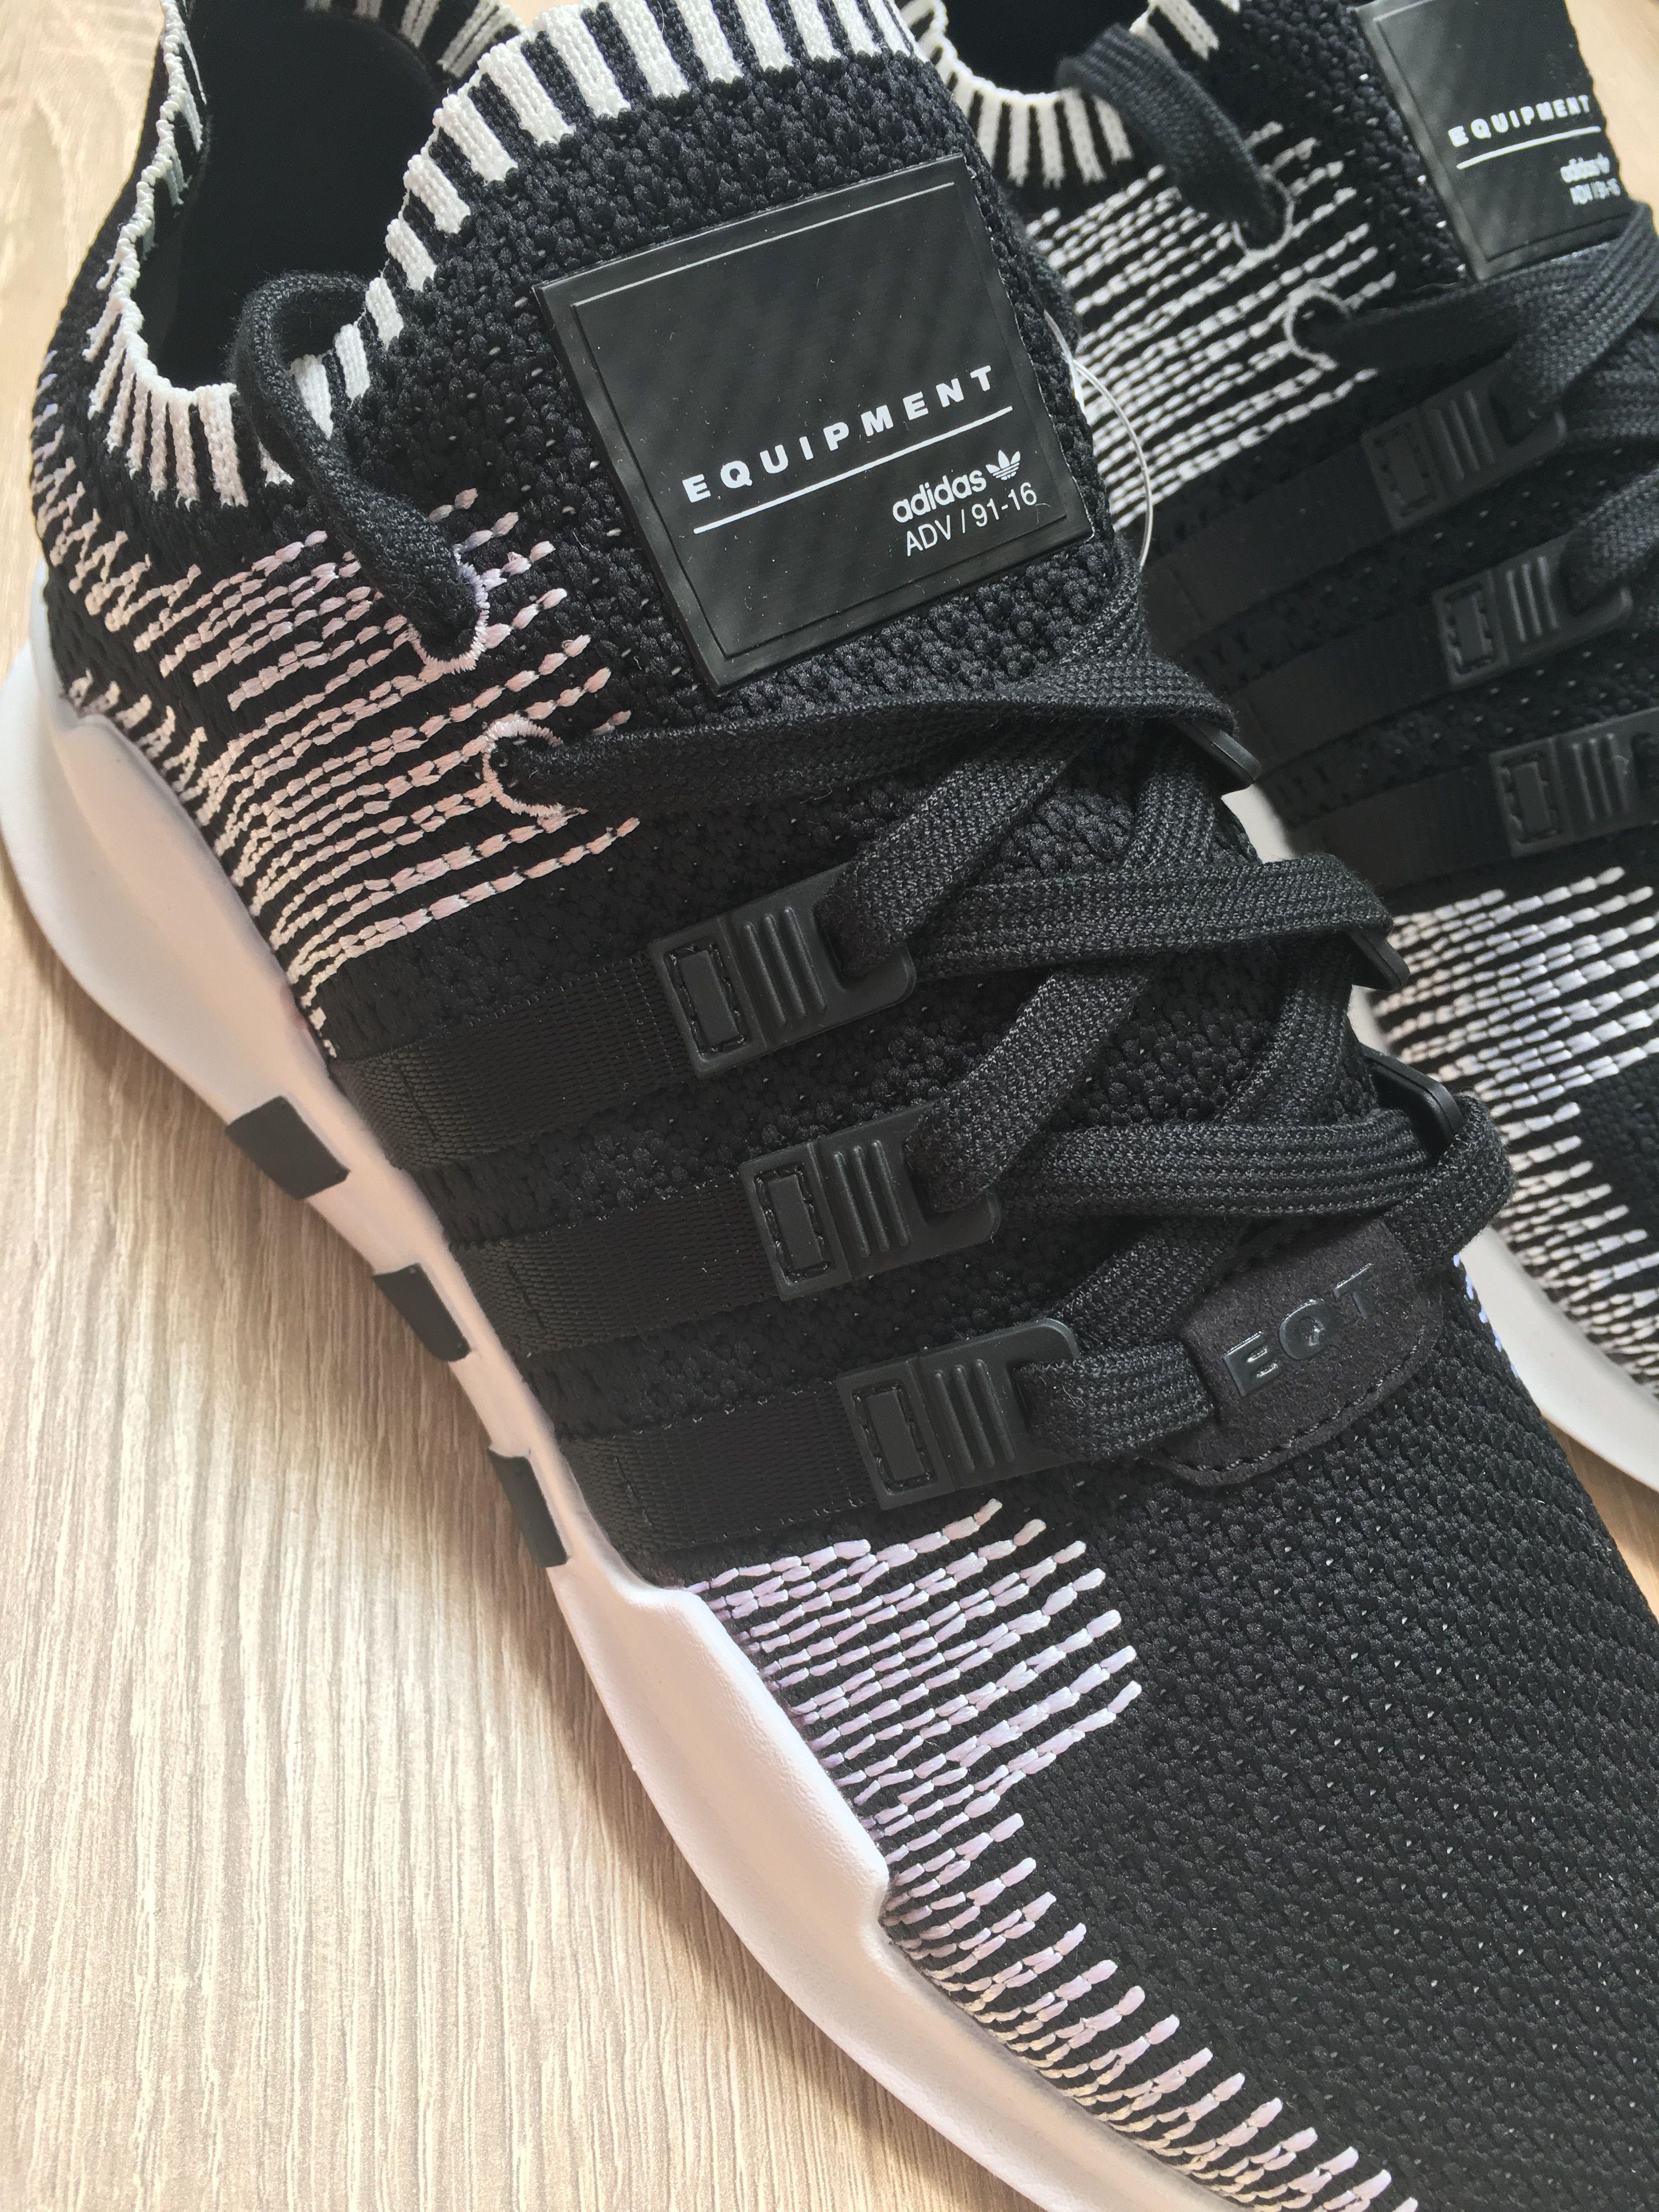 Adidas EQUIPMENT SUPPORT ADV Sneaker Schuh Herren EQT ZX